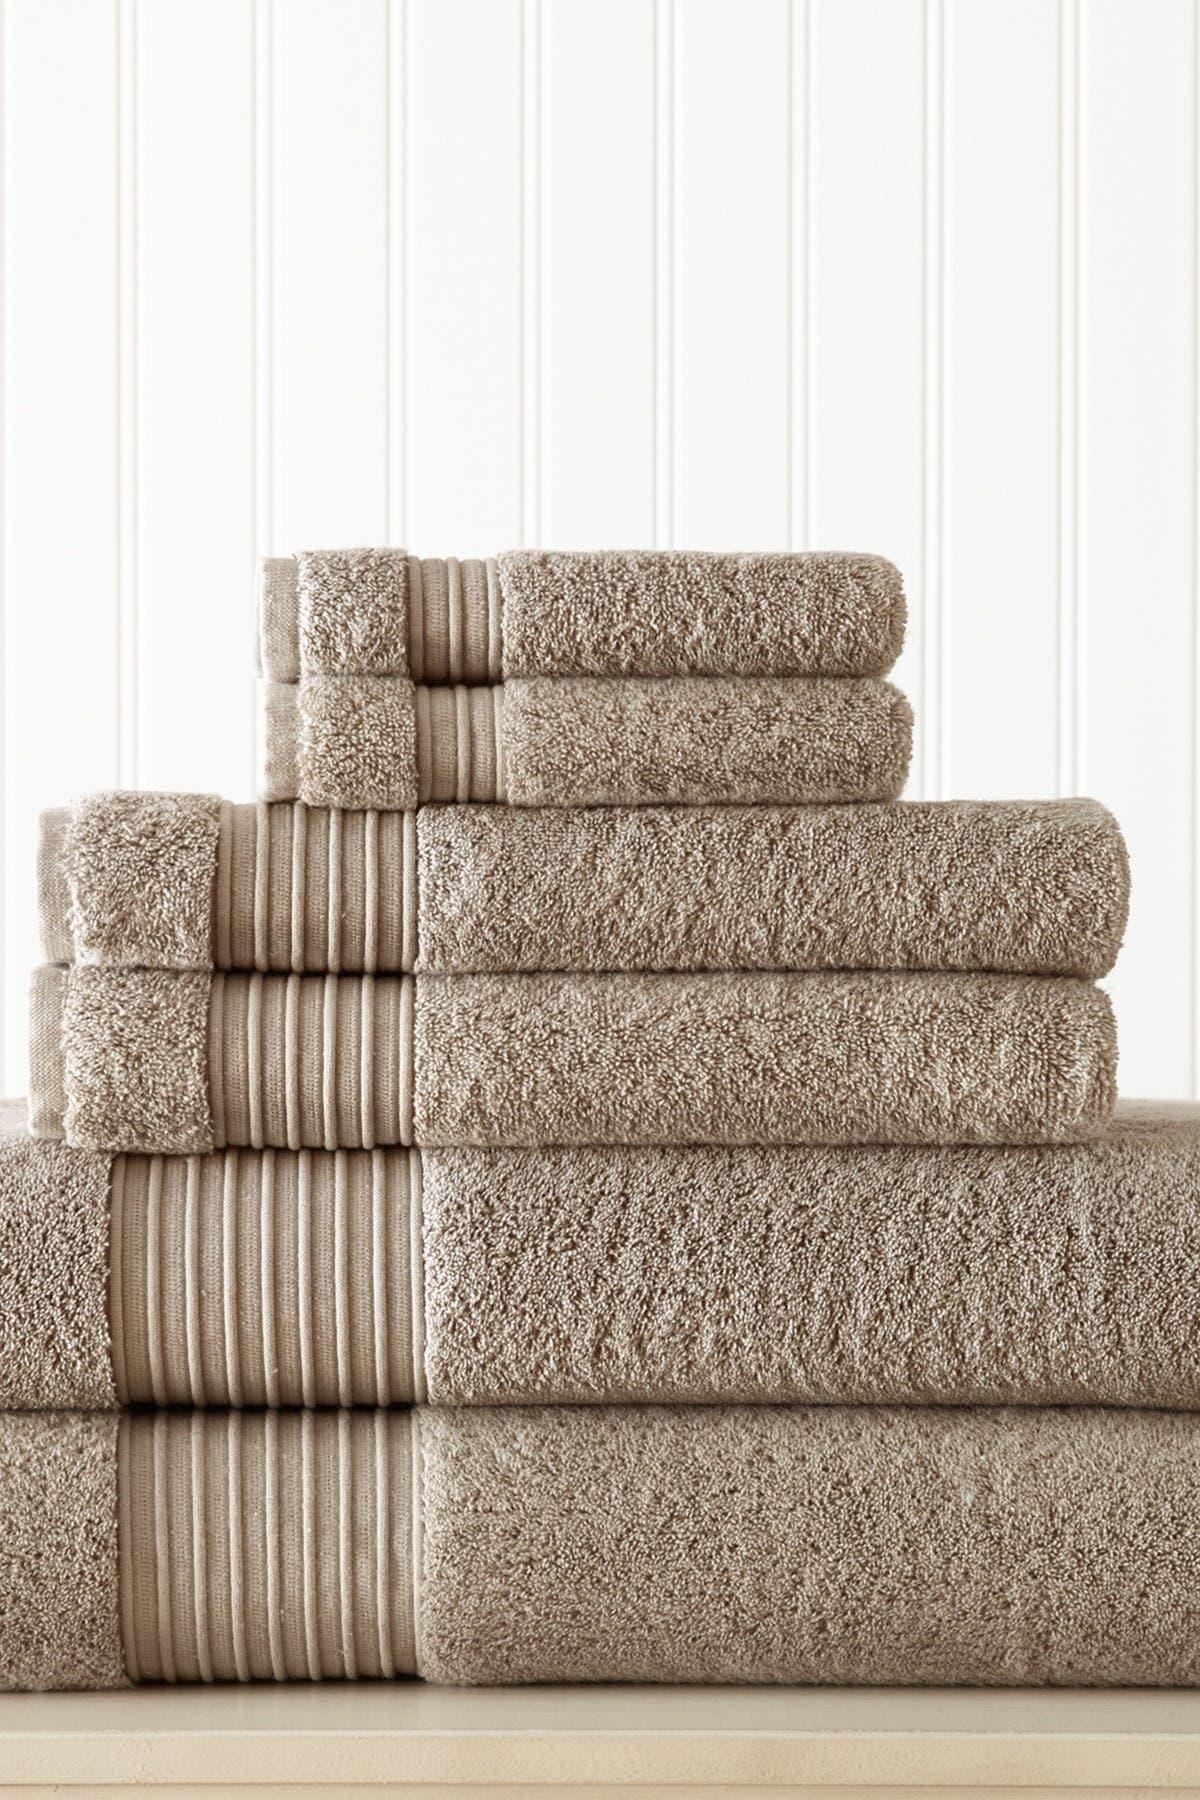 Image of Modern Threads 6-Piece Turkish Cotton Towel Set - Taupe